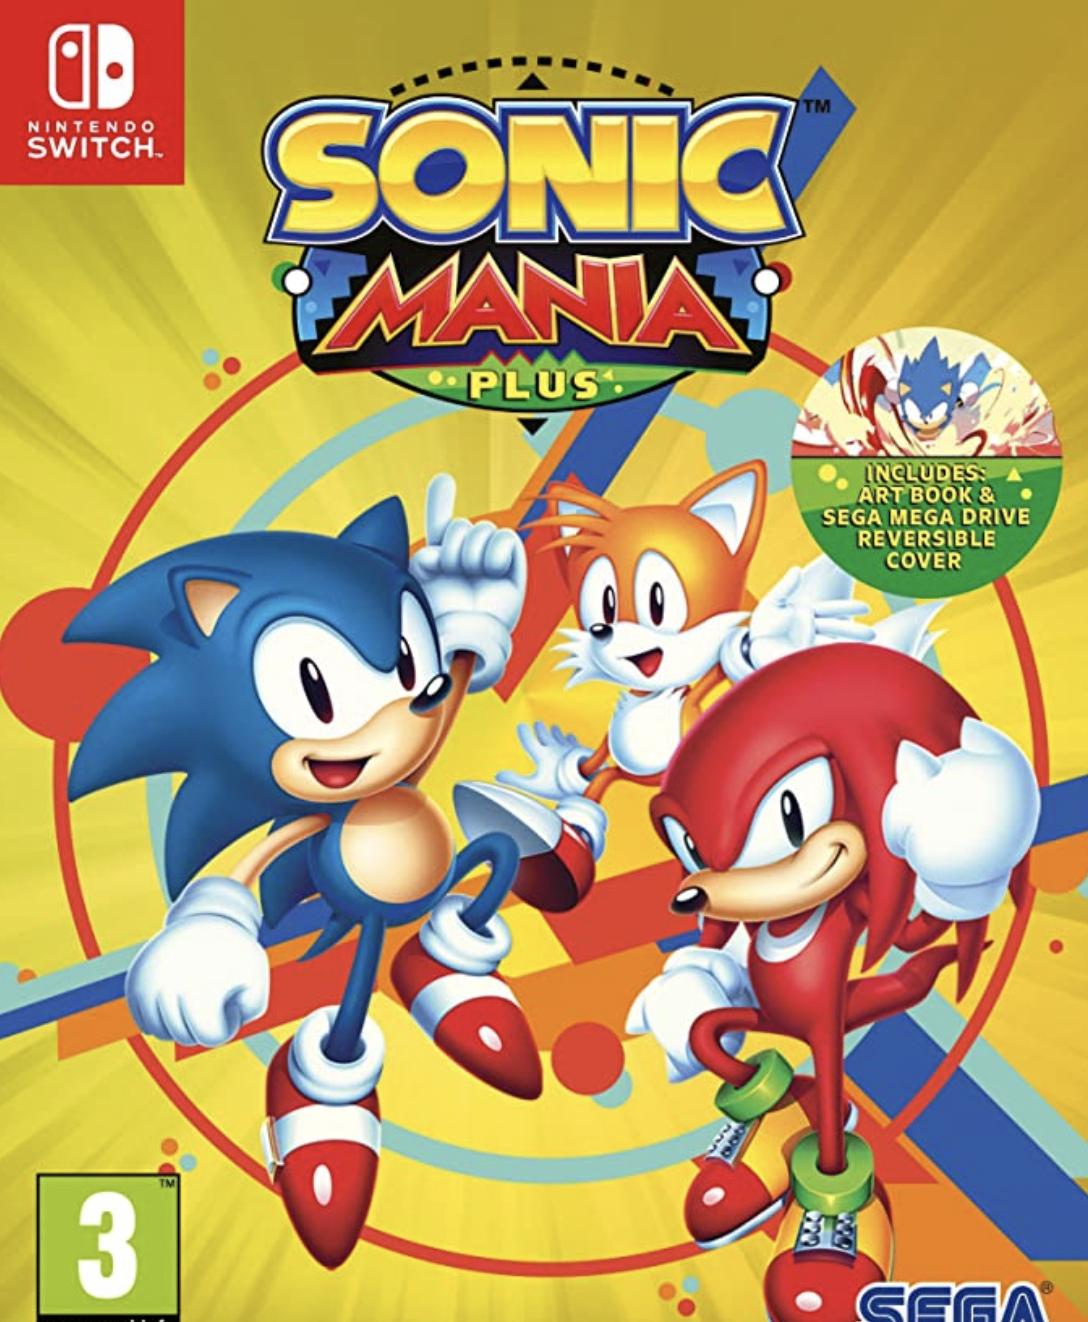 Sonic Mania Plus (Nintendo Switch) £17.30 Prime // 20.29 Non-Prime @ Amazon